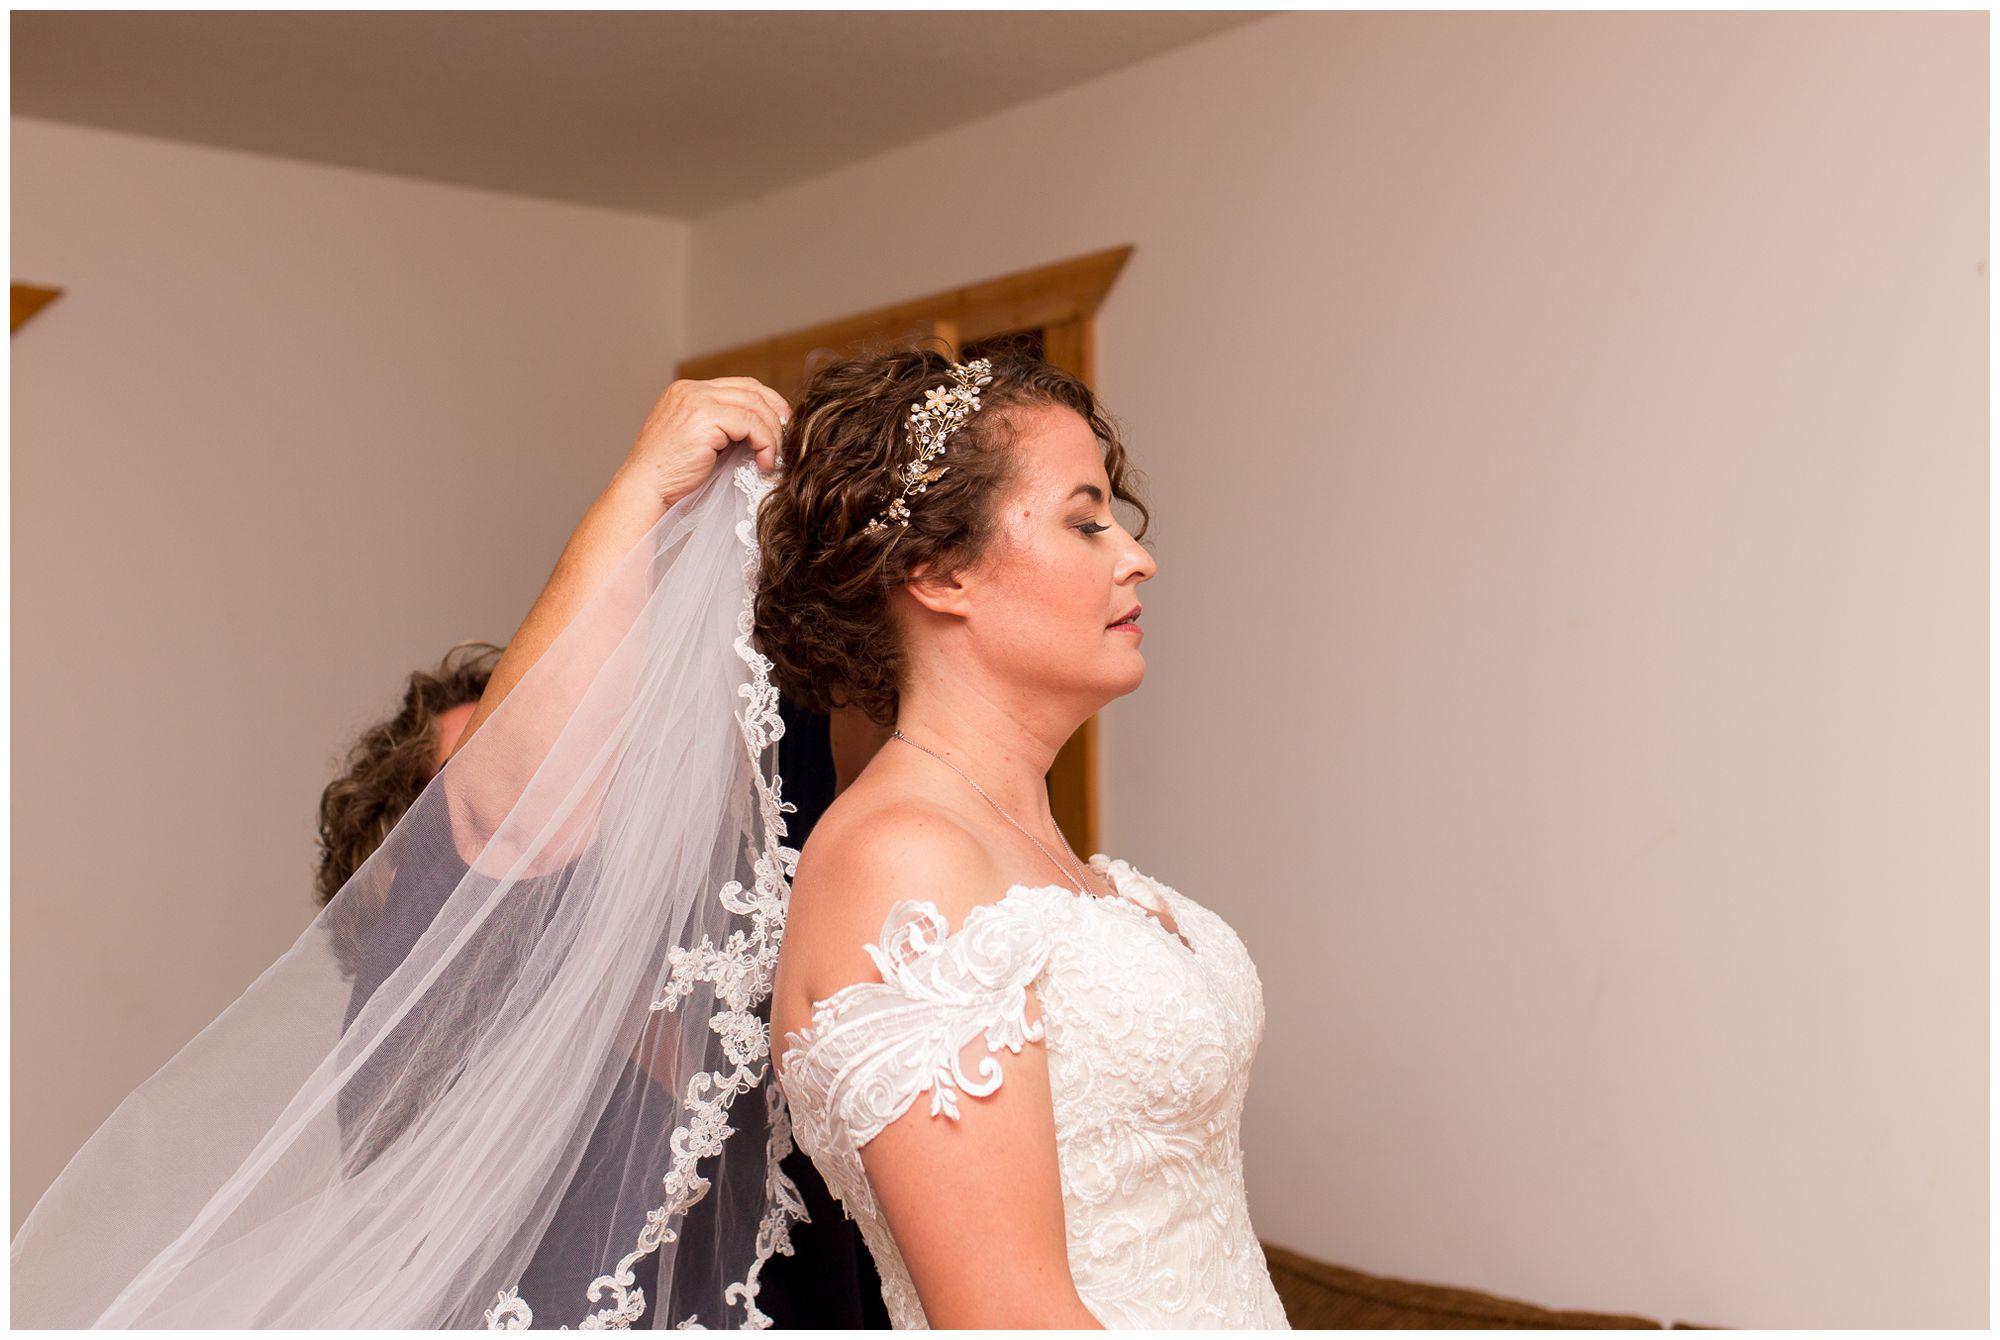 bride's mom puts on bride's veil before wedding in Peru Indiana